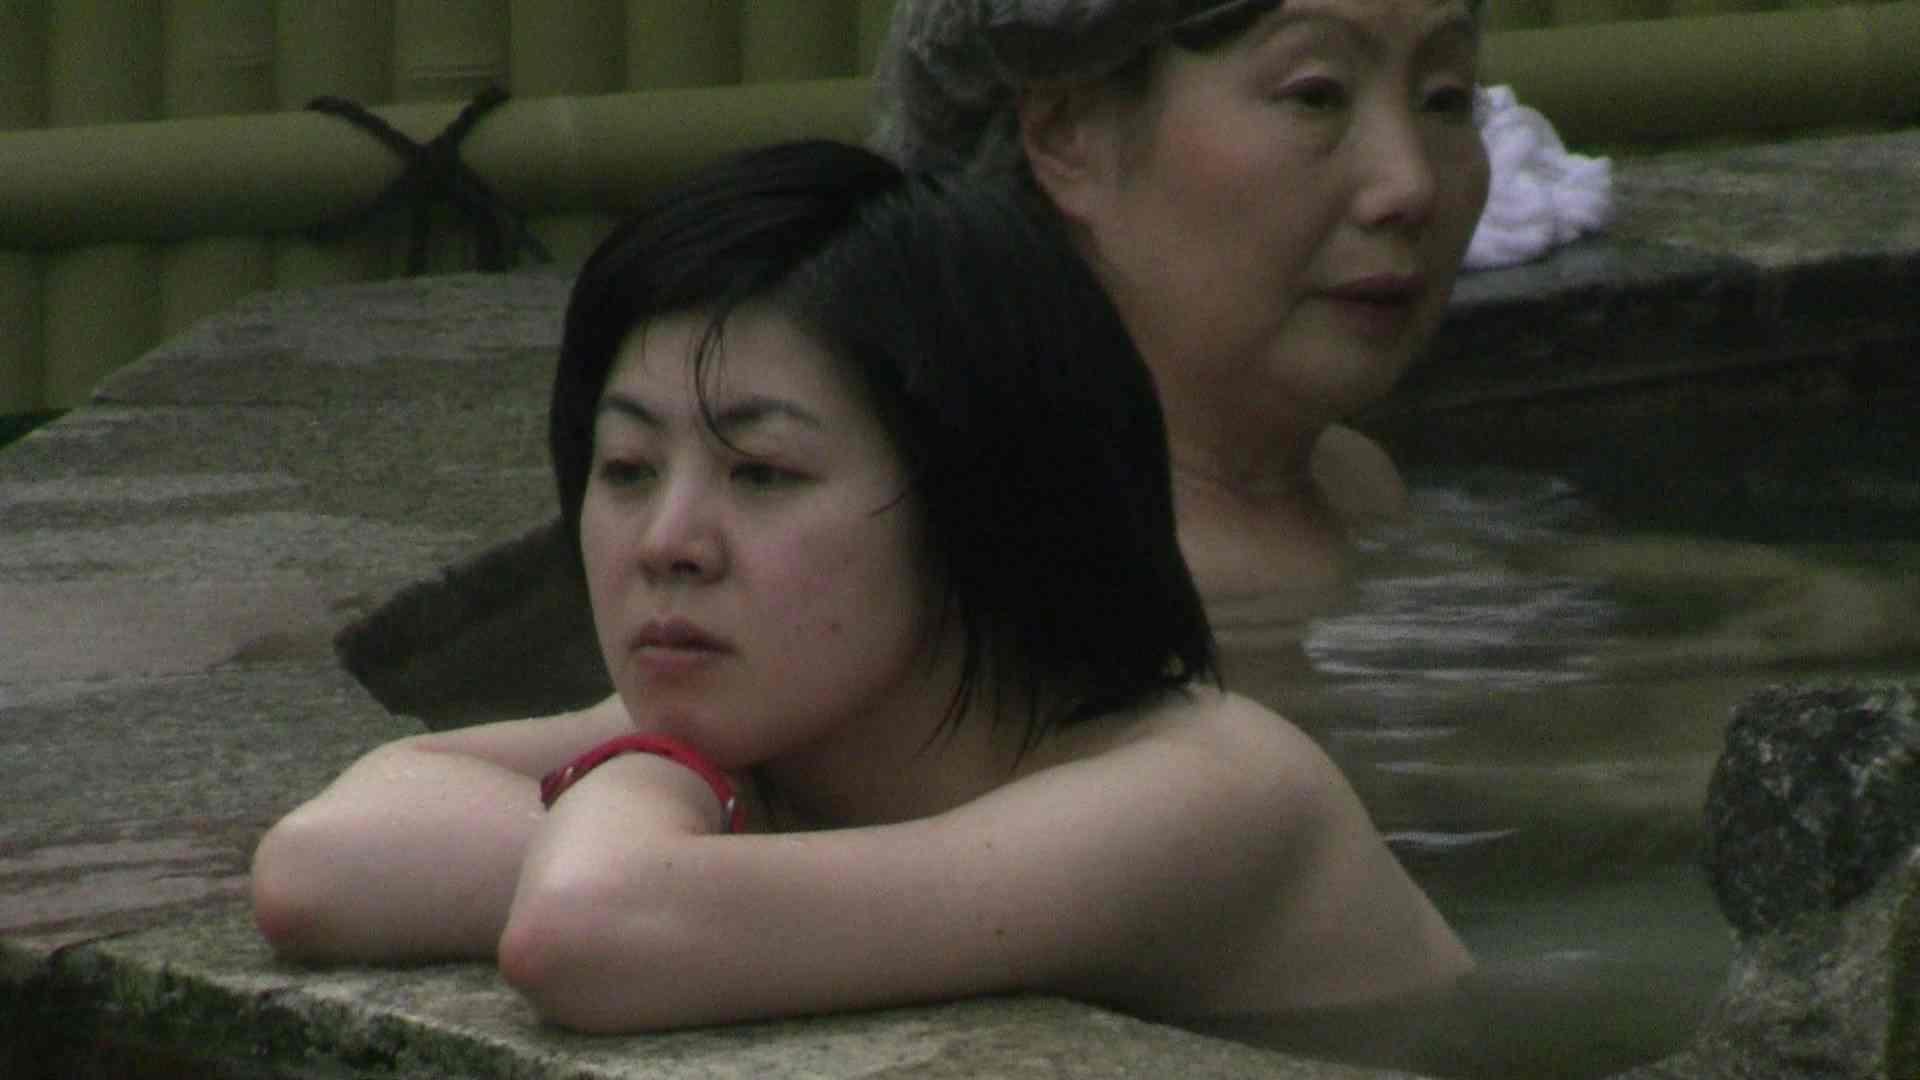 Aquaな露天風呂Vol.685 OLのプライベート   盗撮特撮  13pic 4